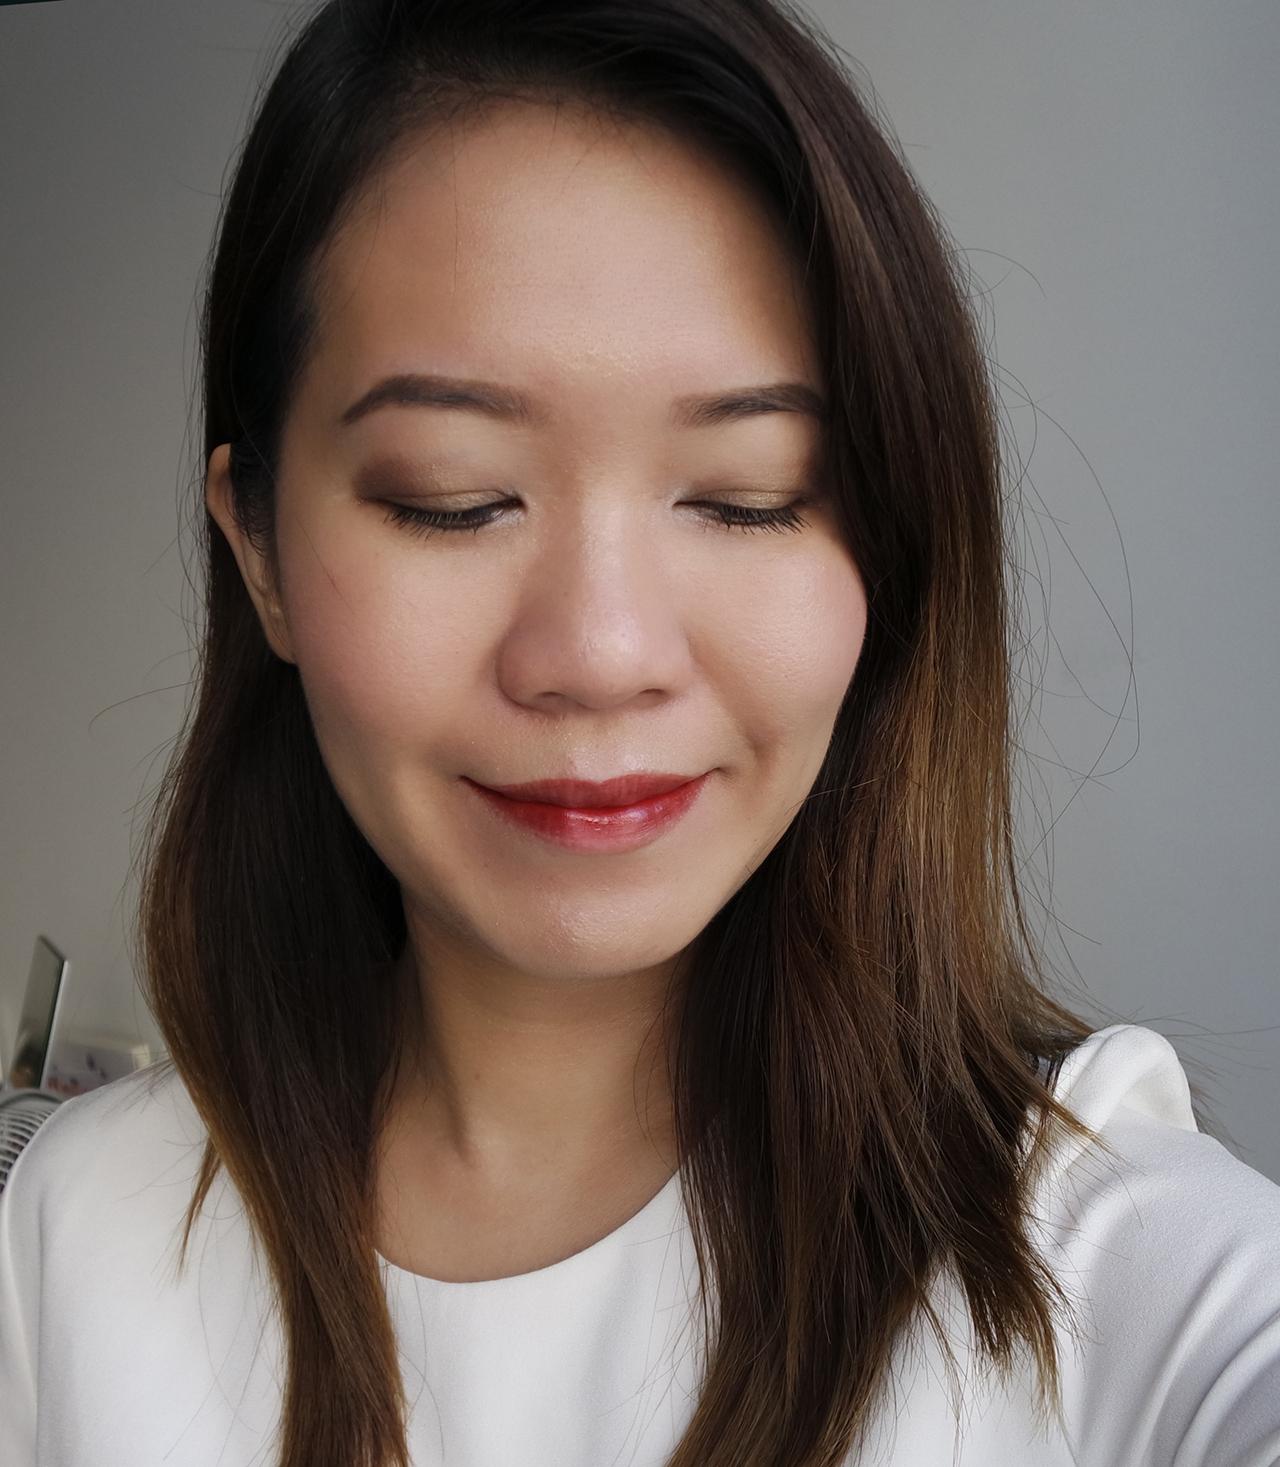 Zoeva The Basic Moment makeup look